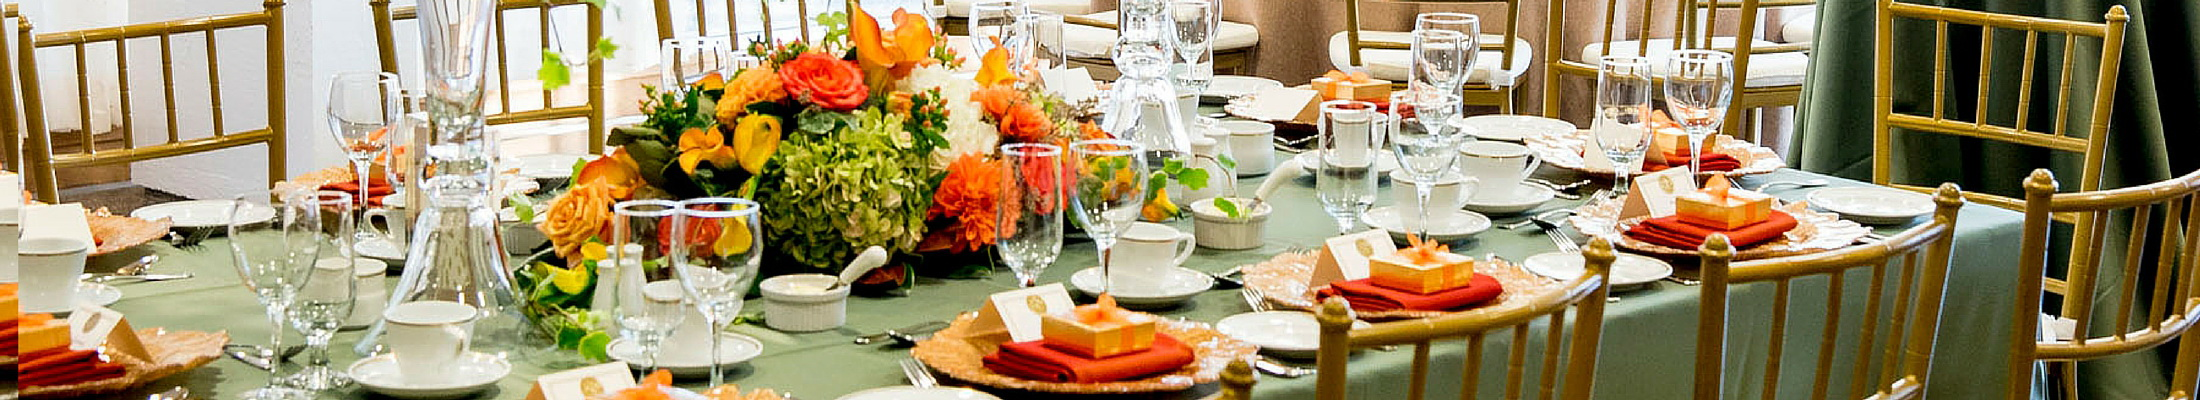 Caledon autumn wedding catering designs